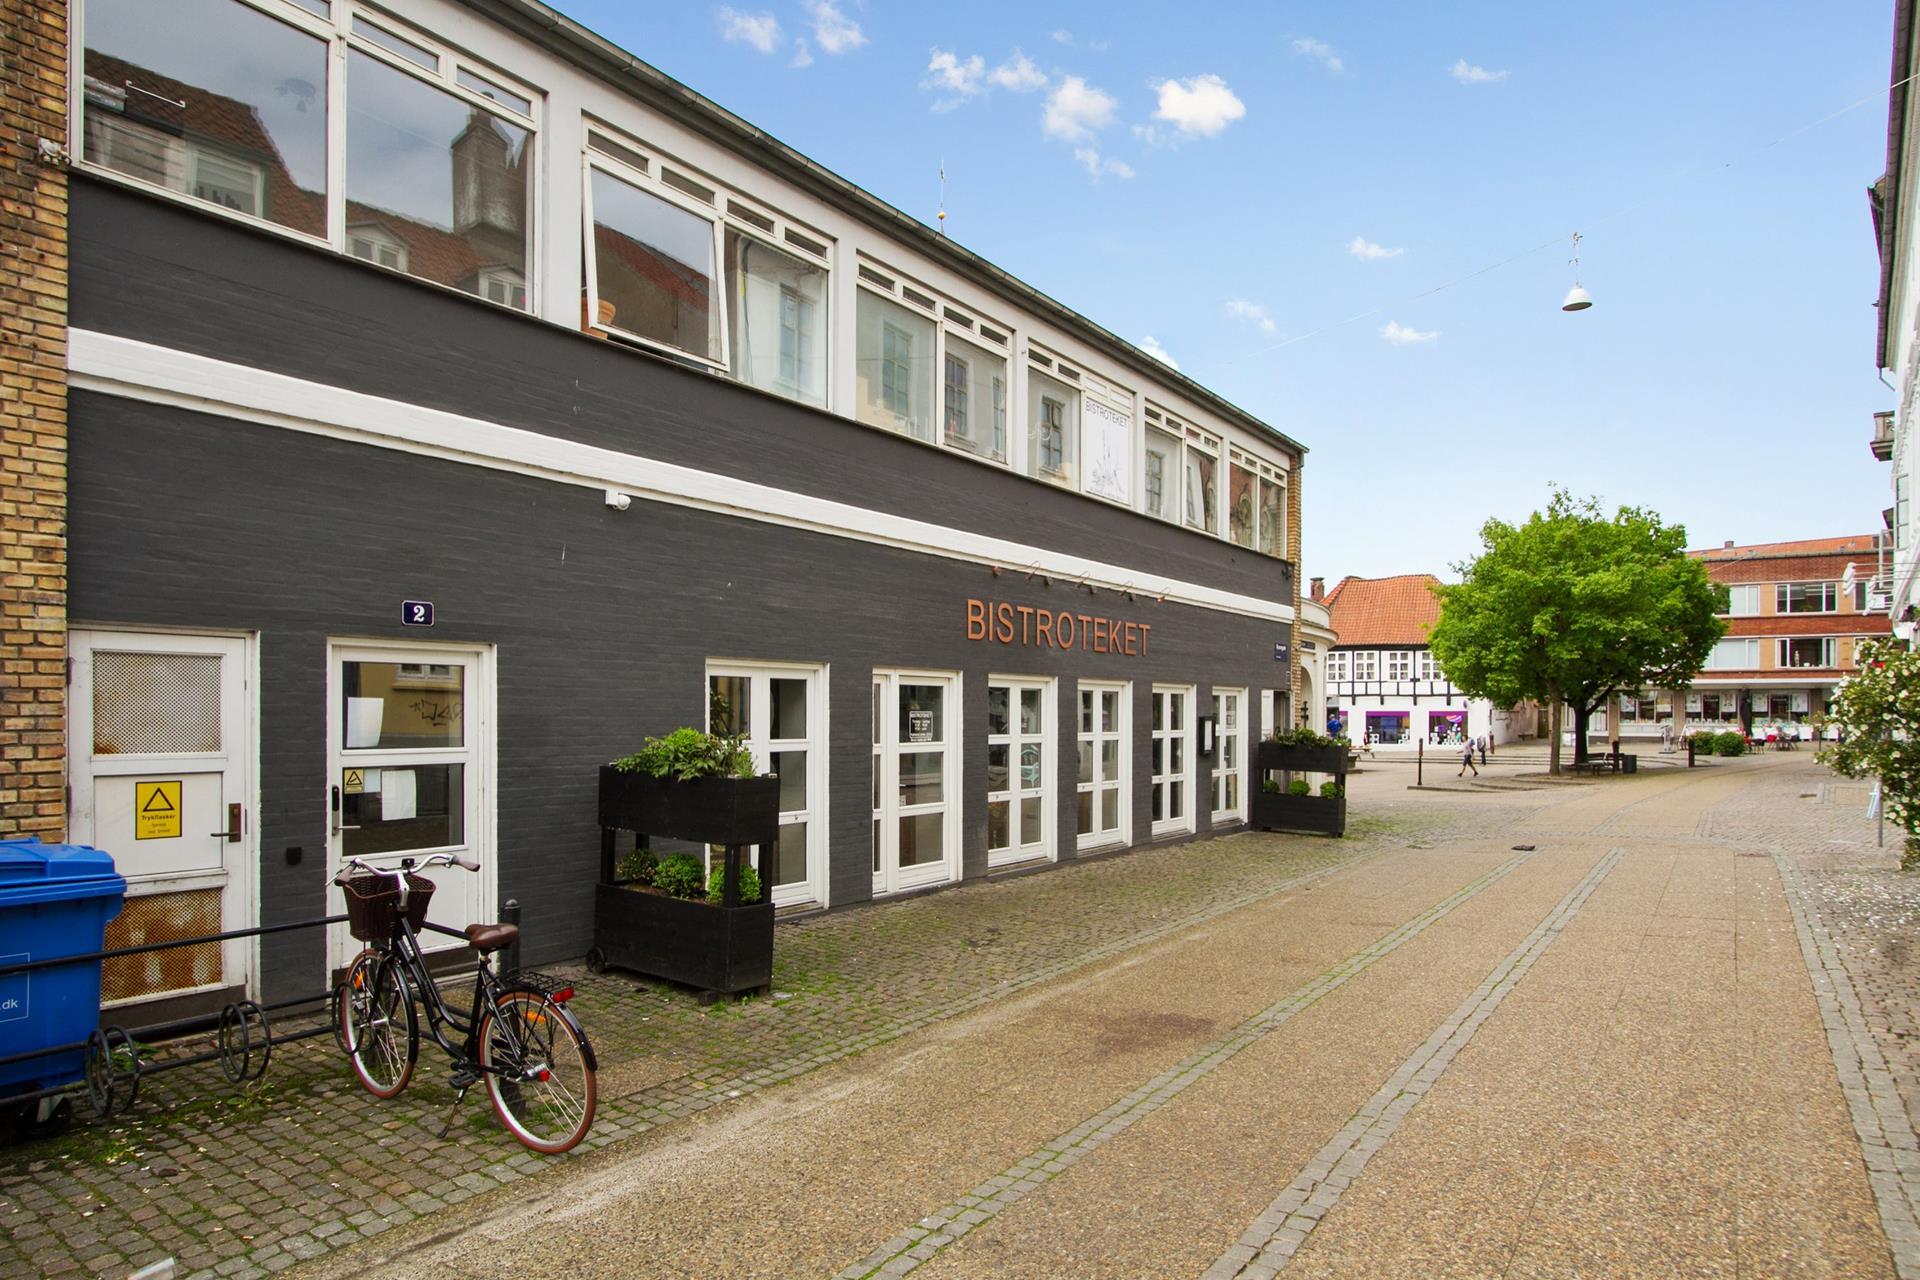 Bolig/erhverv på Rådhusstræde i Randers C - Facade